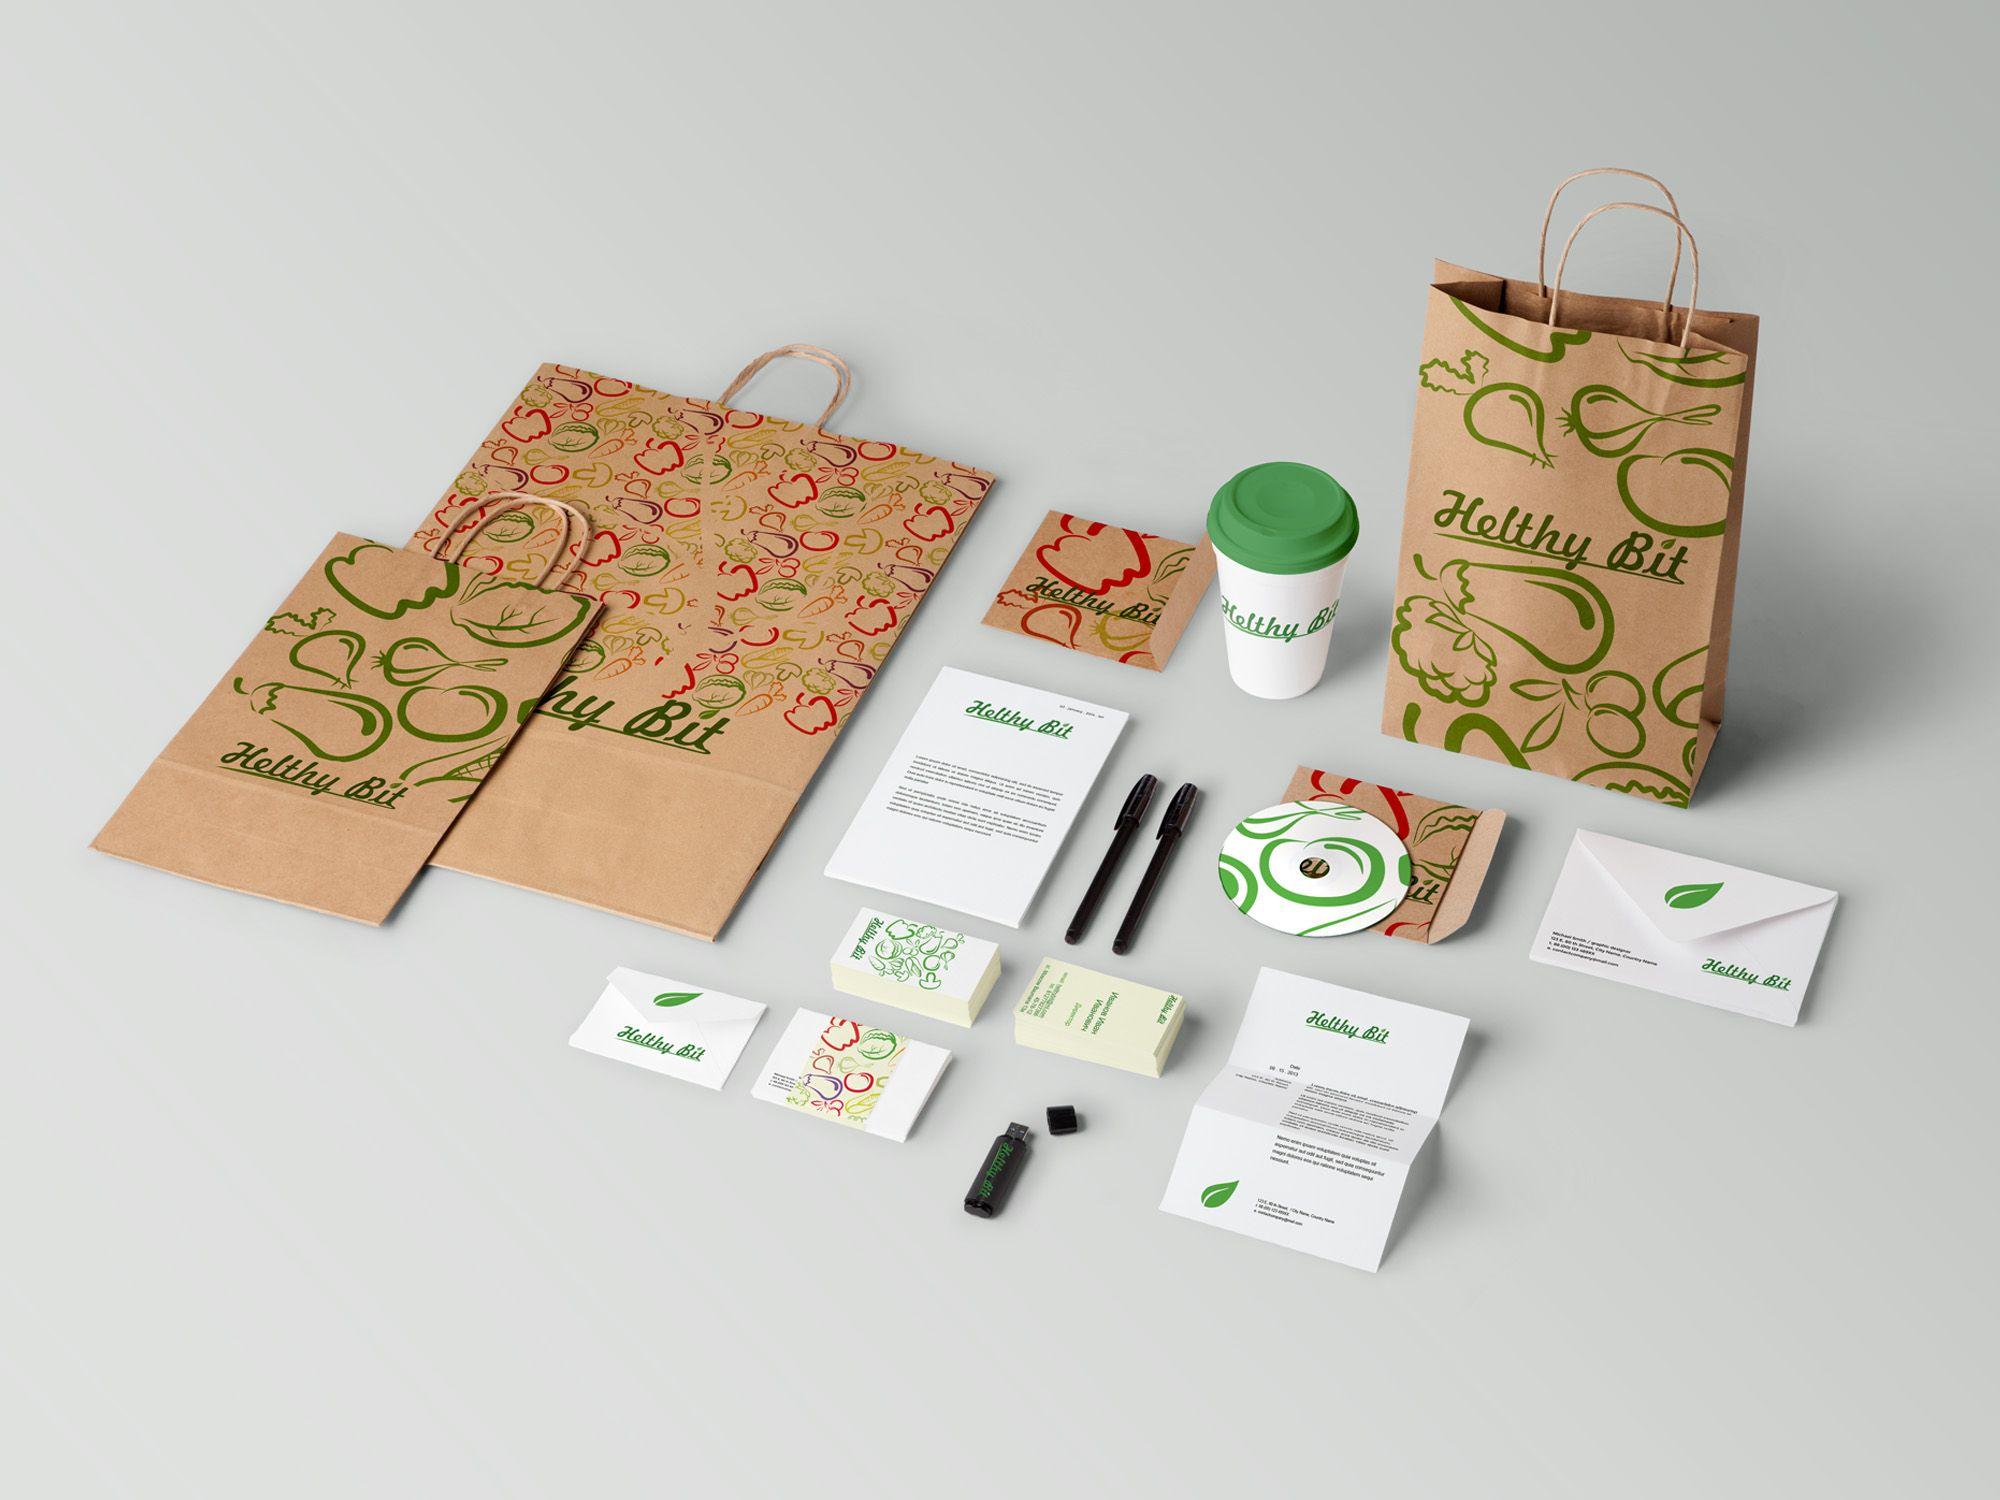 Healthy Bit или Healthy Beet - дизайнер toster108